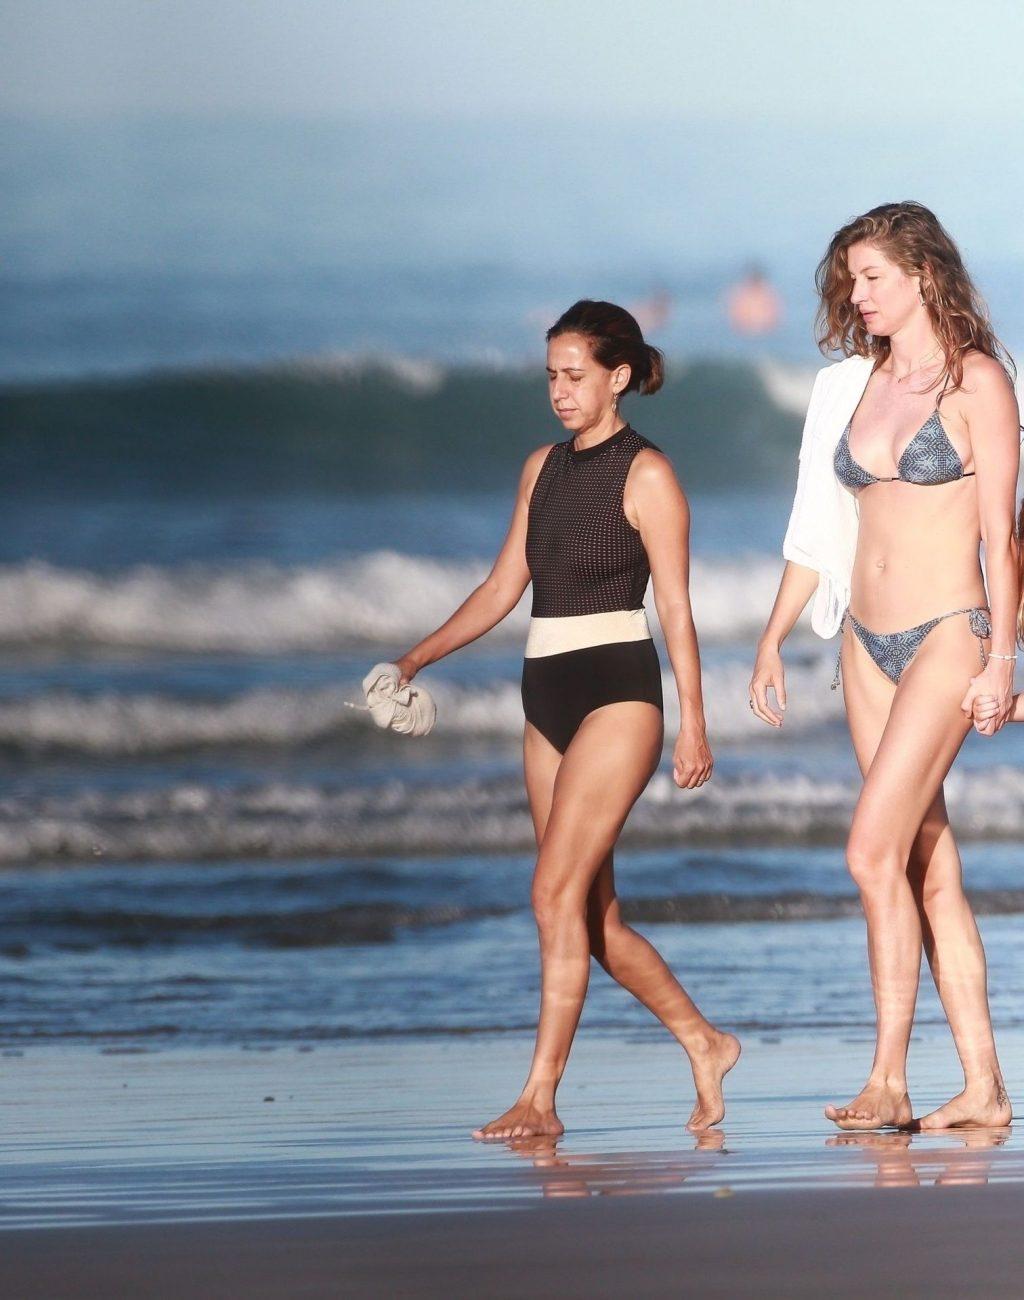 Gisele Bundchen Takes Her Morning Walk in Costa Rica (21 Photos)